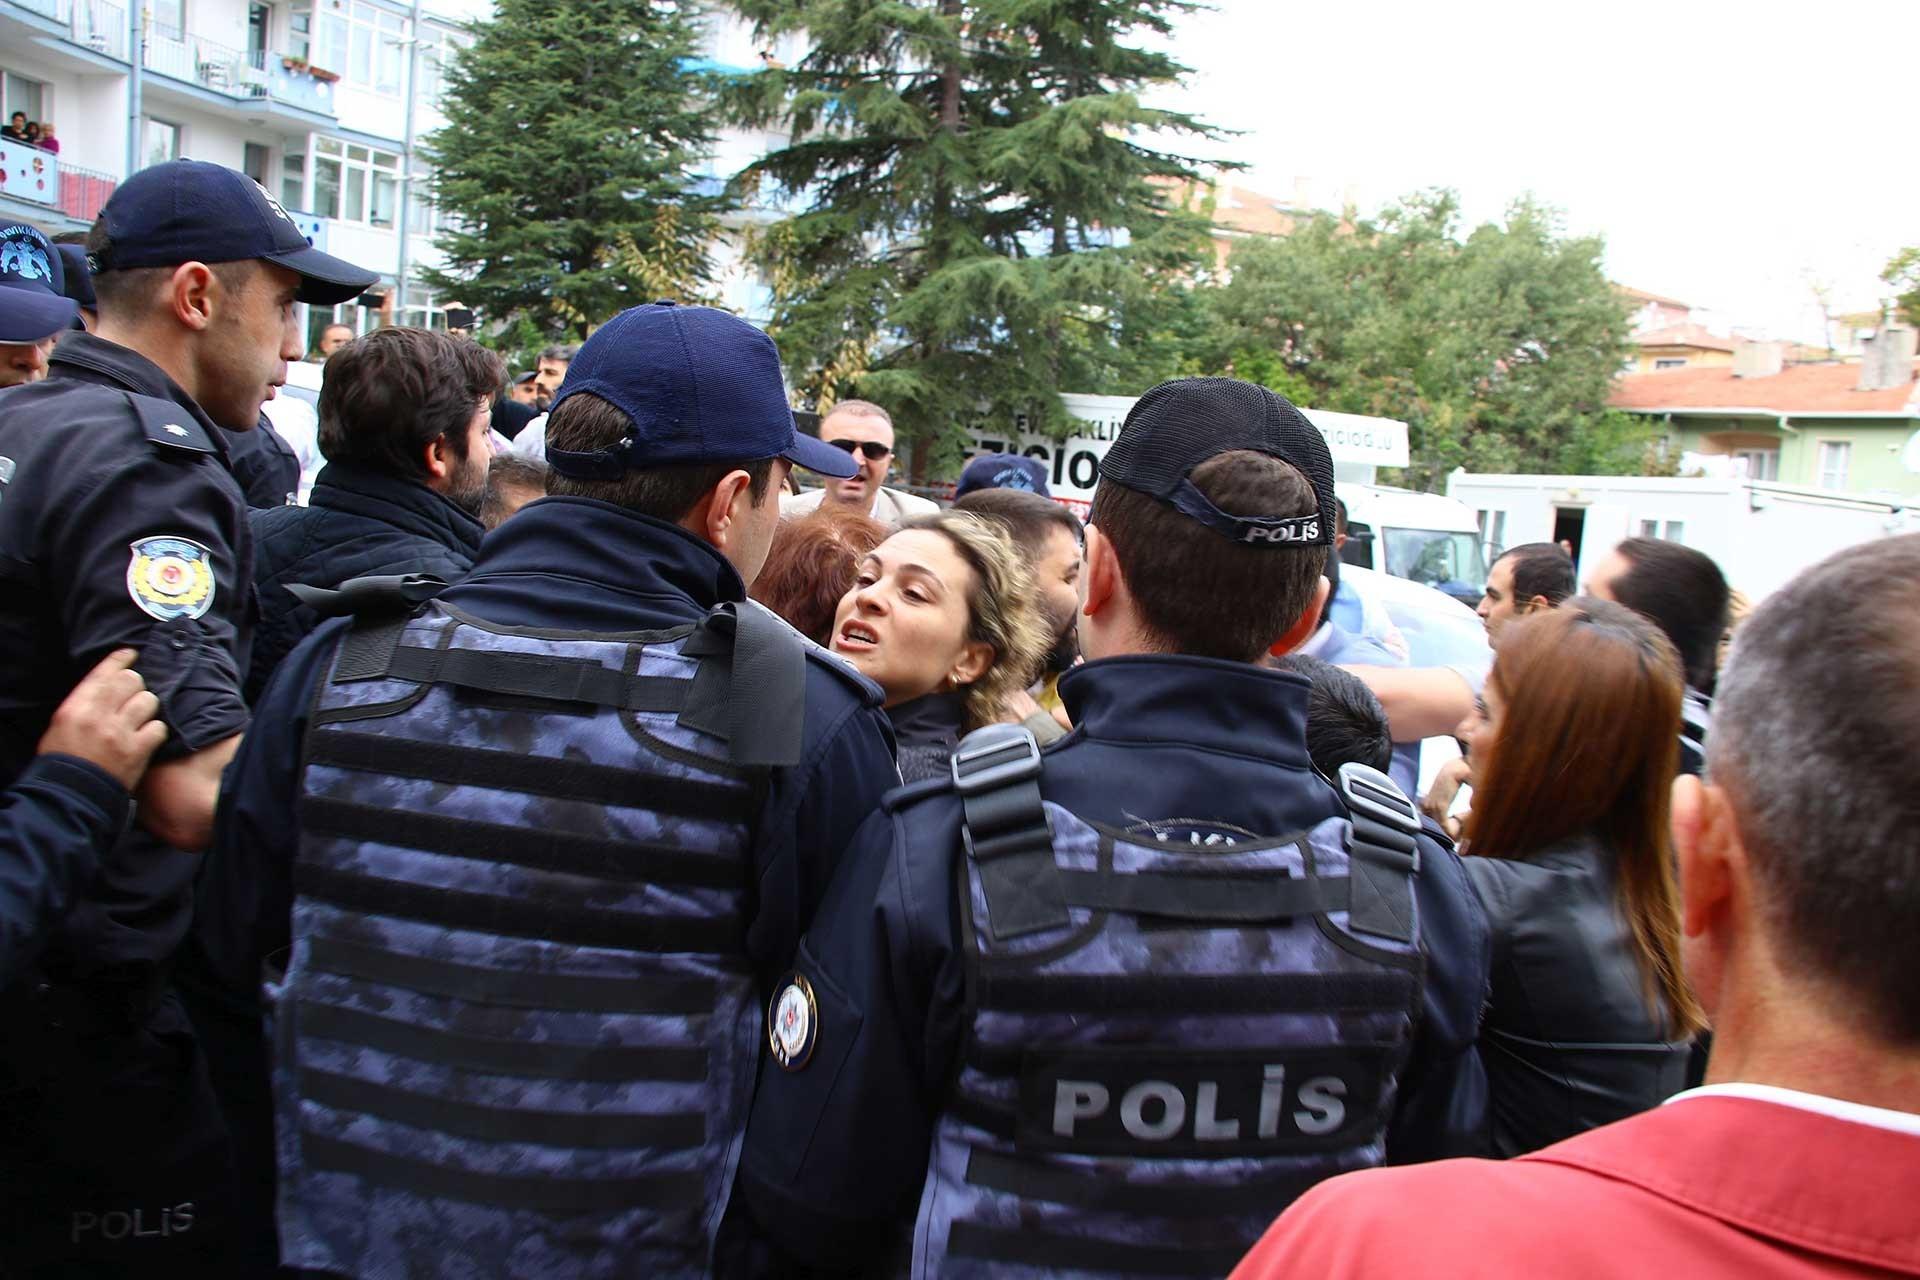 Ankara'ya gelen KHK'liler polis tarafından engellendi